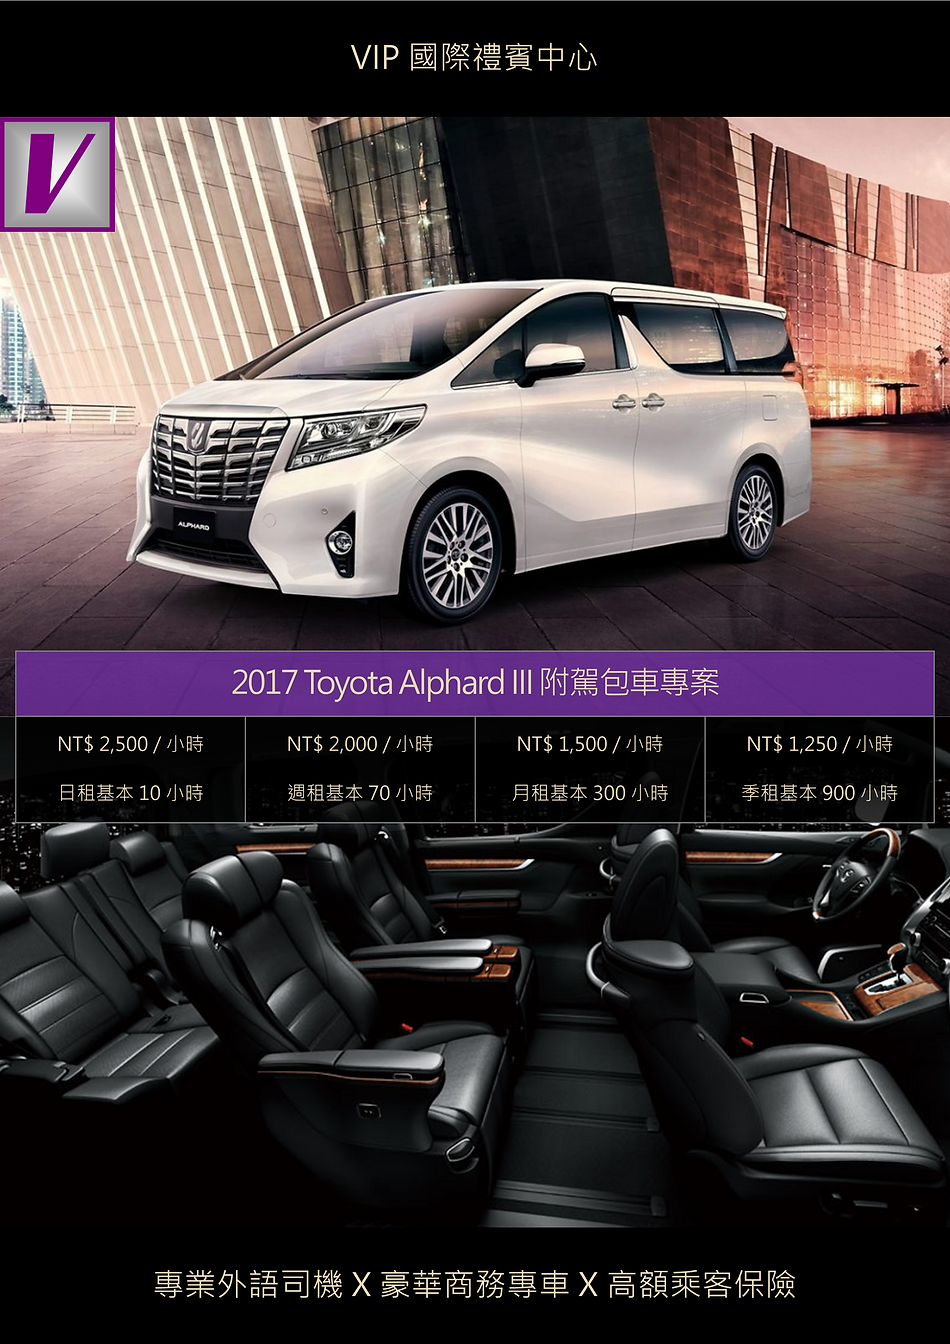 VIP國際禮賓中心 2017 TOYOTA ALPHARD III 附駕包車專案 DM.png